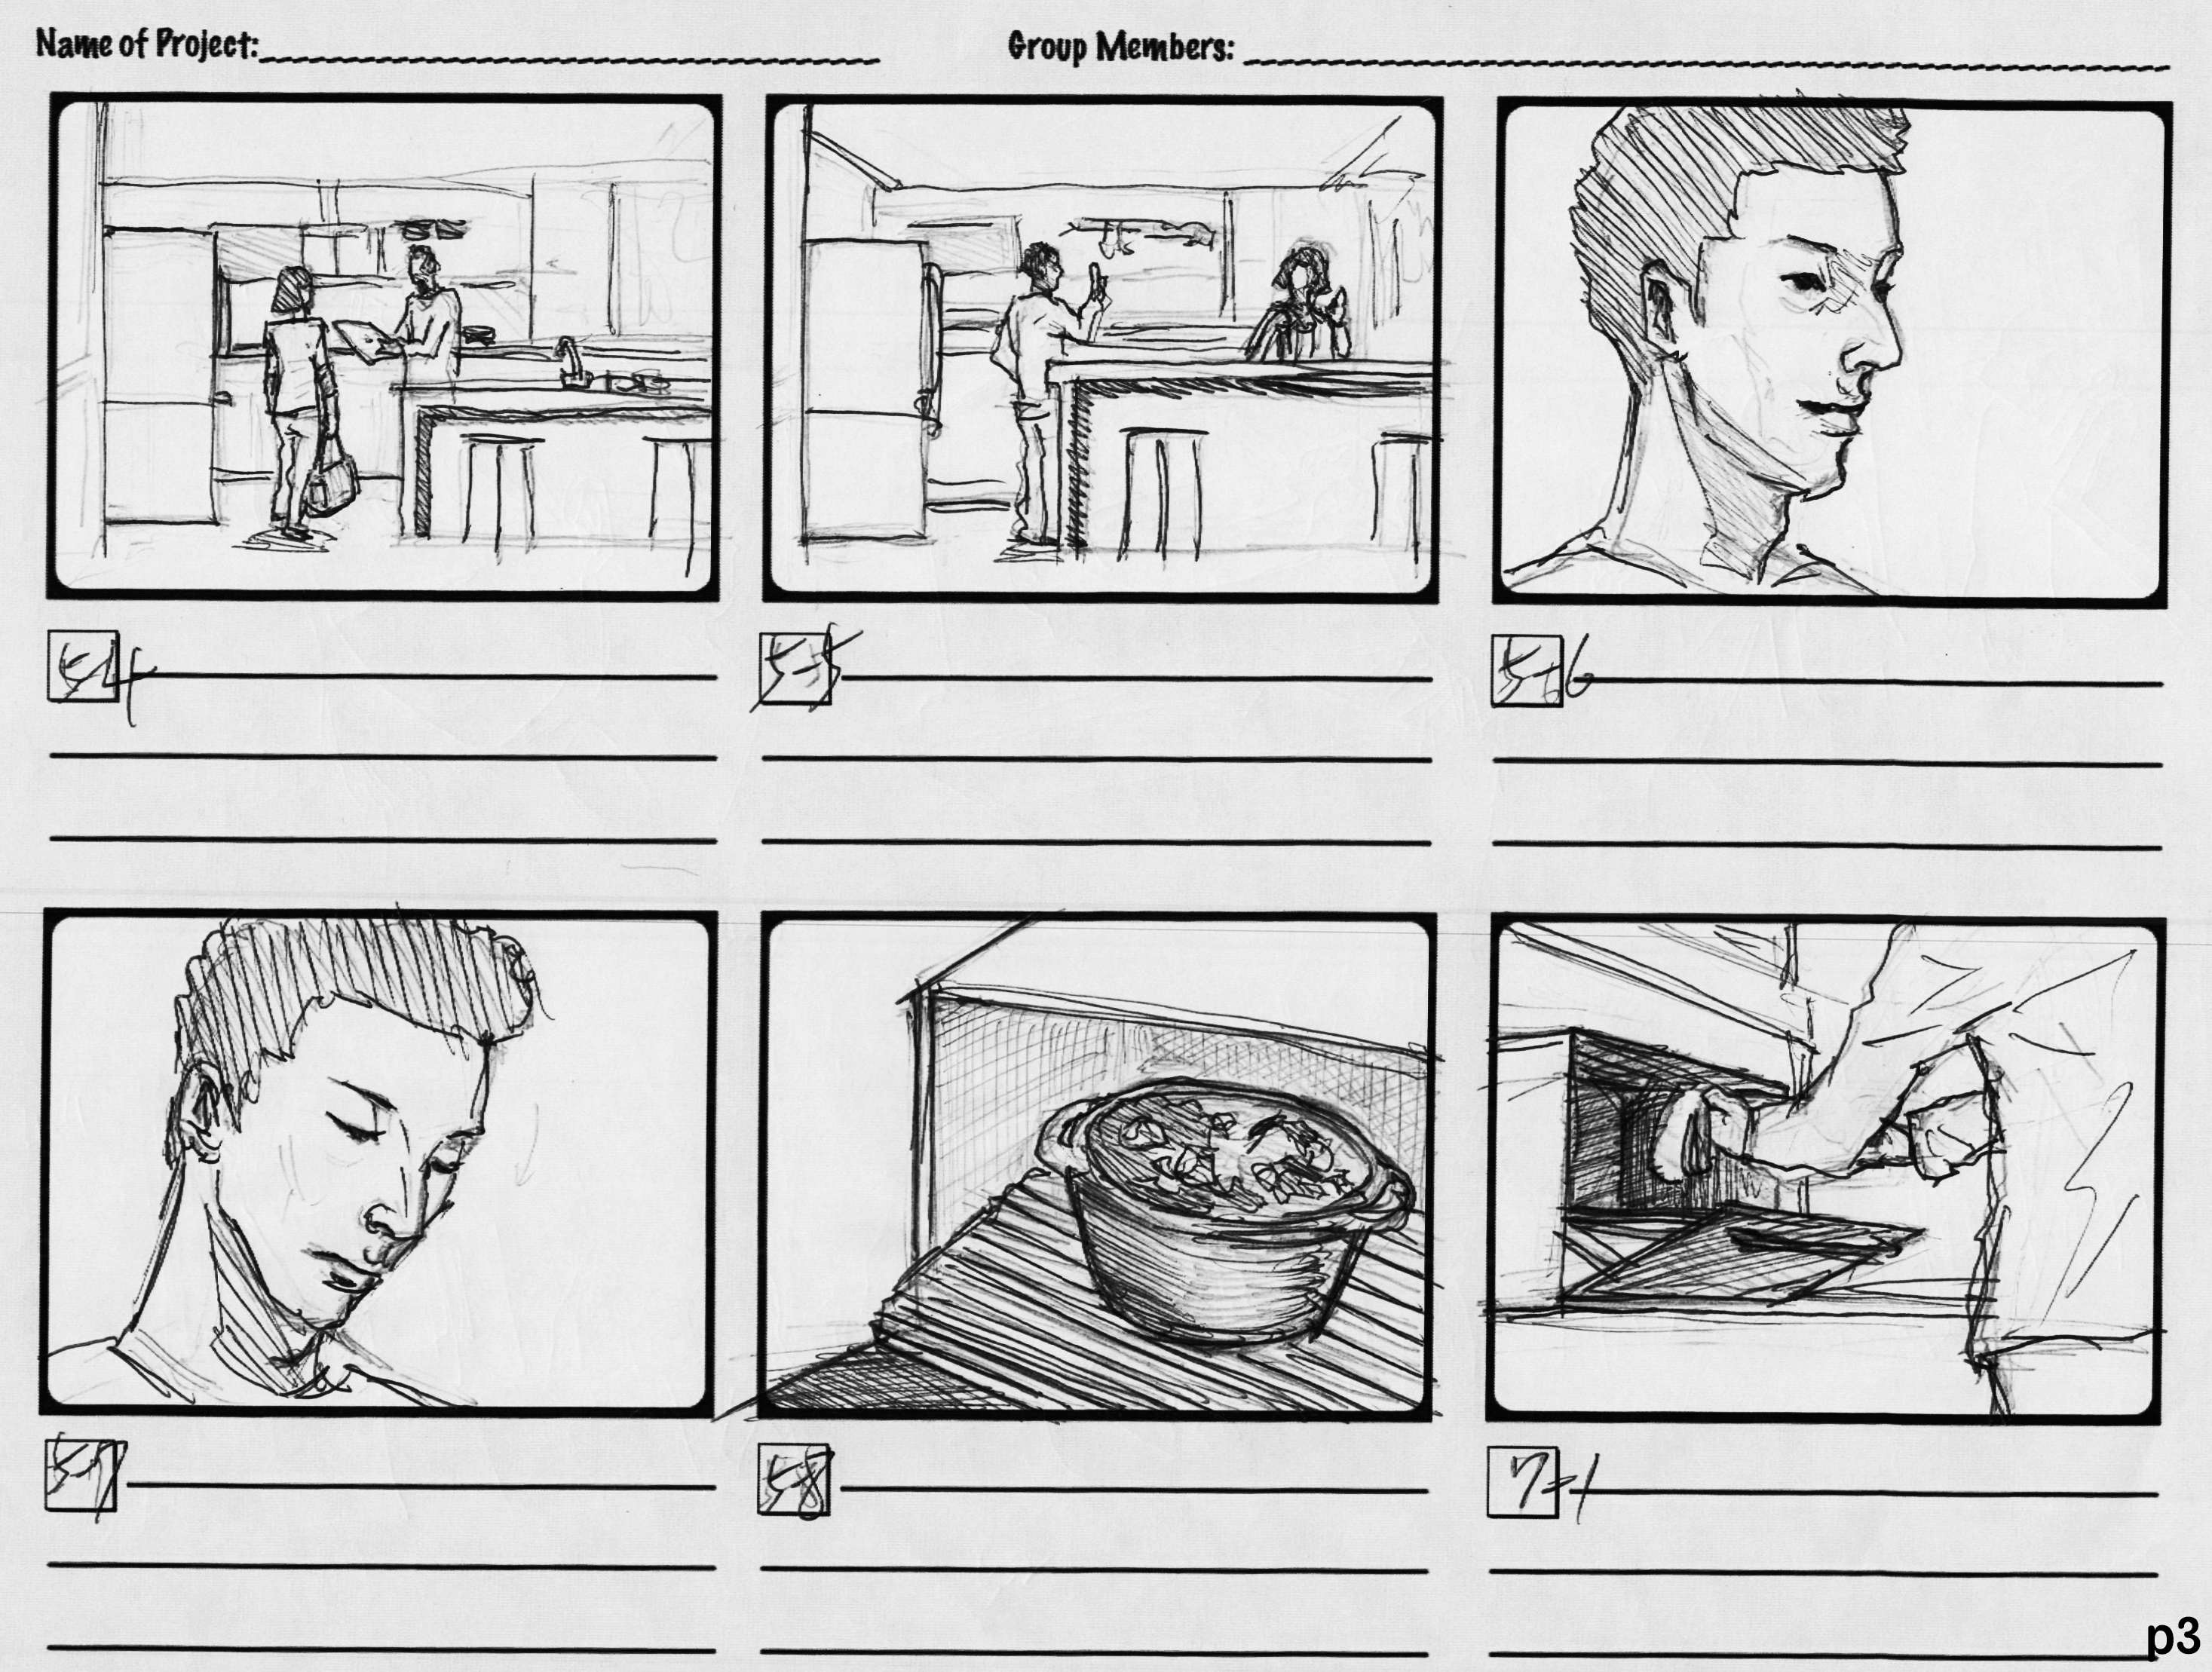 Whirlpool washing machine/Ad video/storyboard